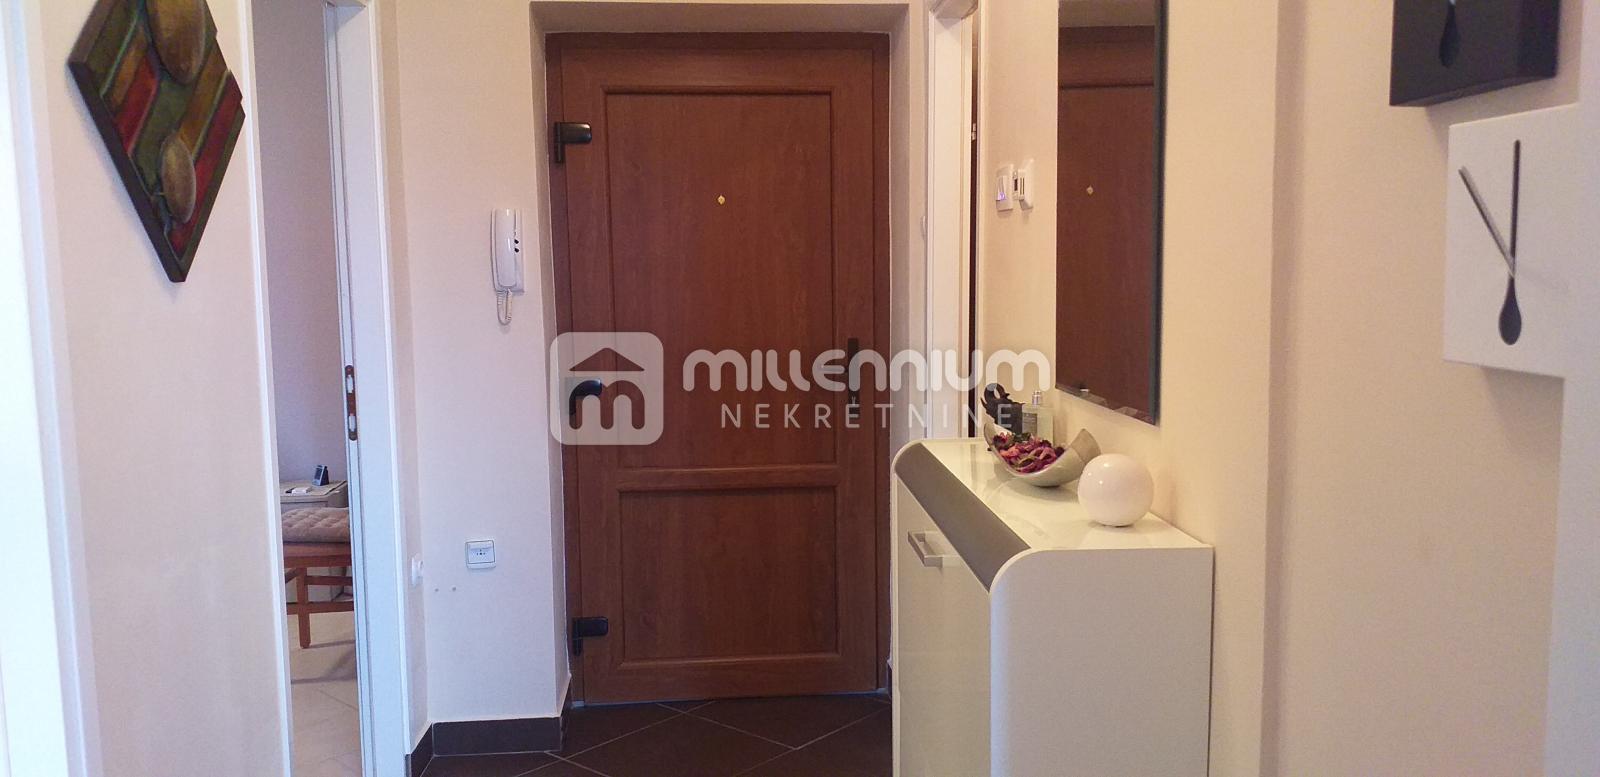 Rijeka, Krnjevo, 51.70m2, adaptiran 2-sobni stan, balkon